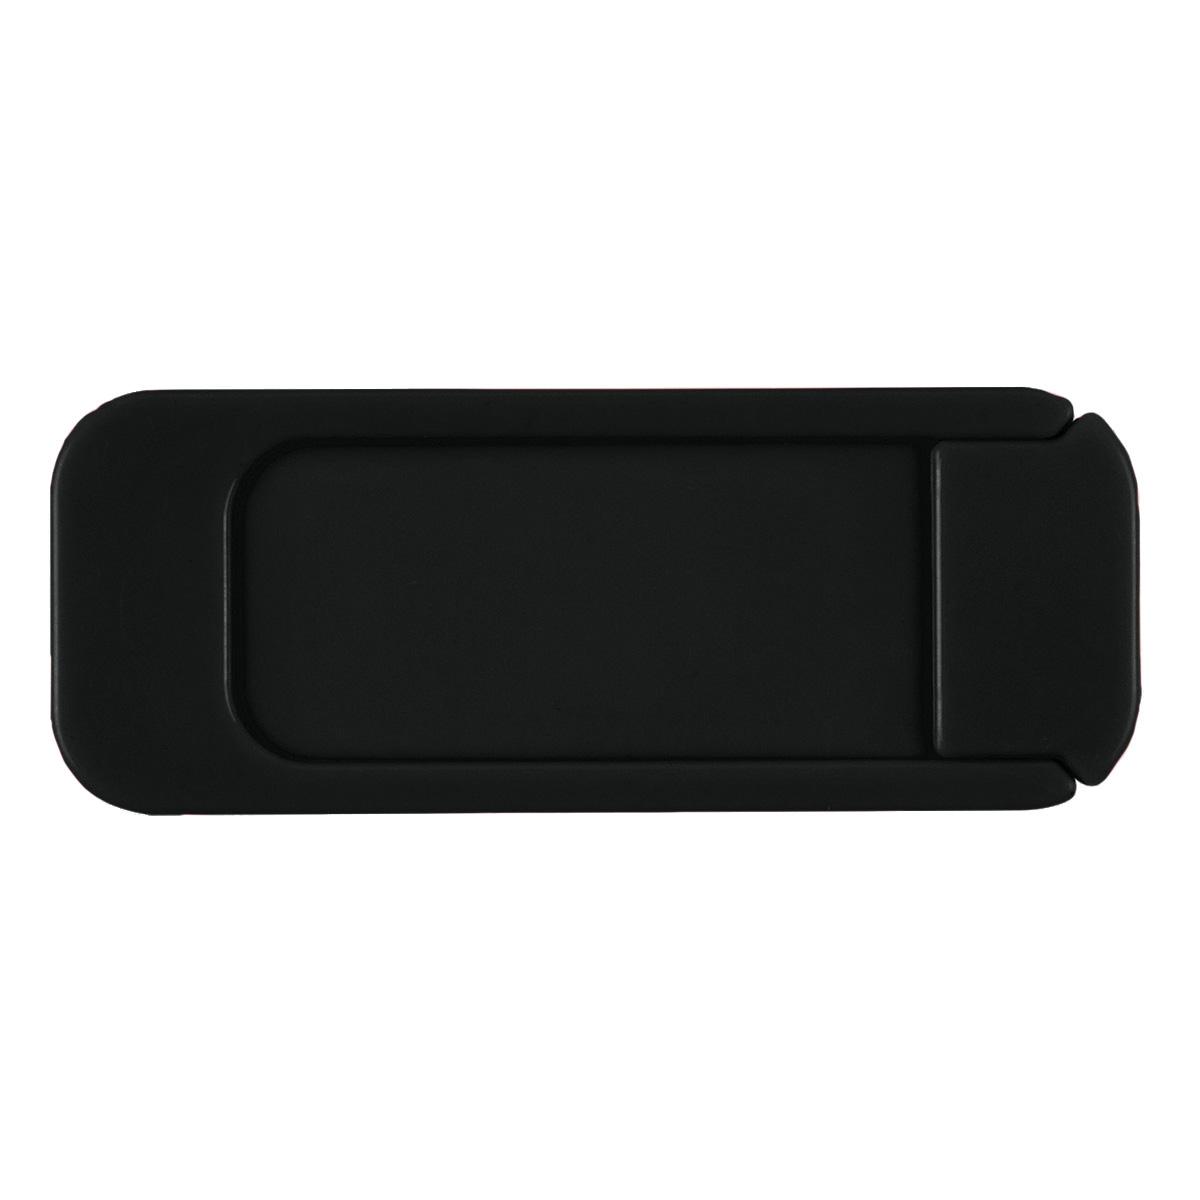 265 - Cubierta para Webcam